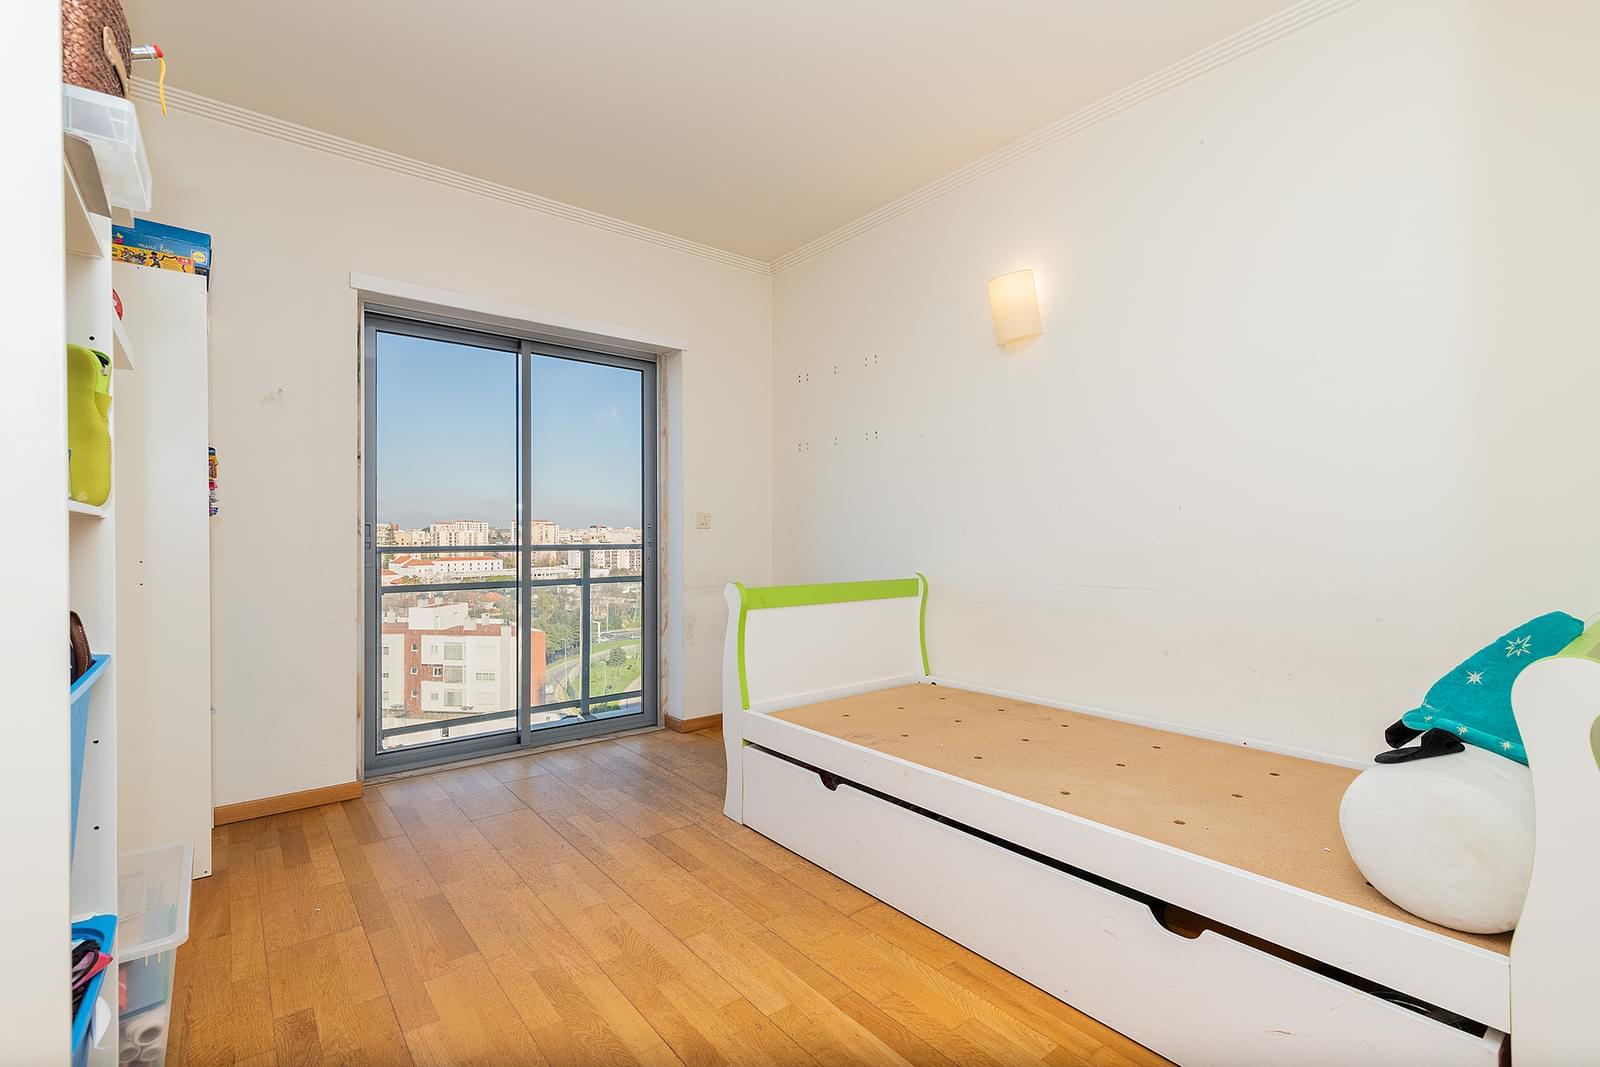 pf18953-apartamento-t3-lisboa-7448354b-6e8b-4c43-ad09-29b8bc60c384